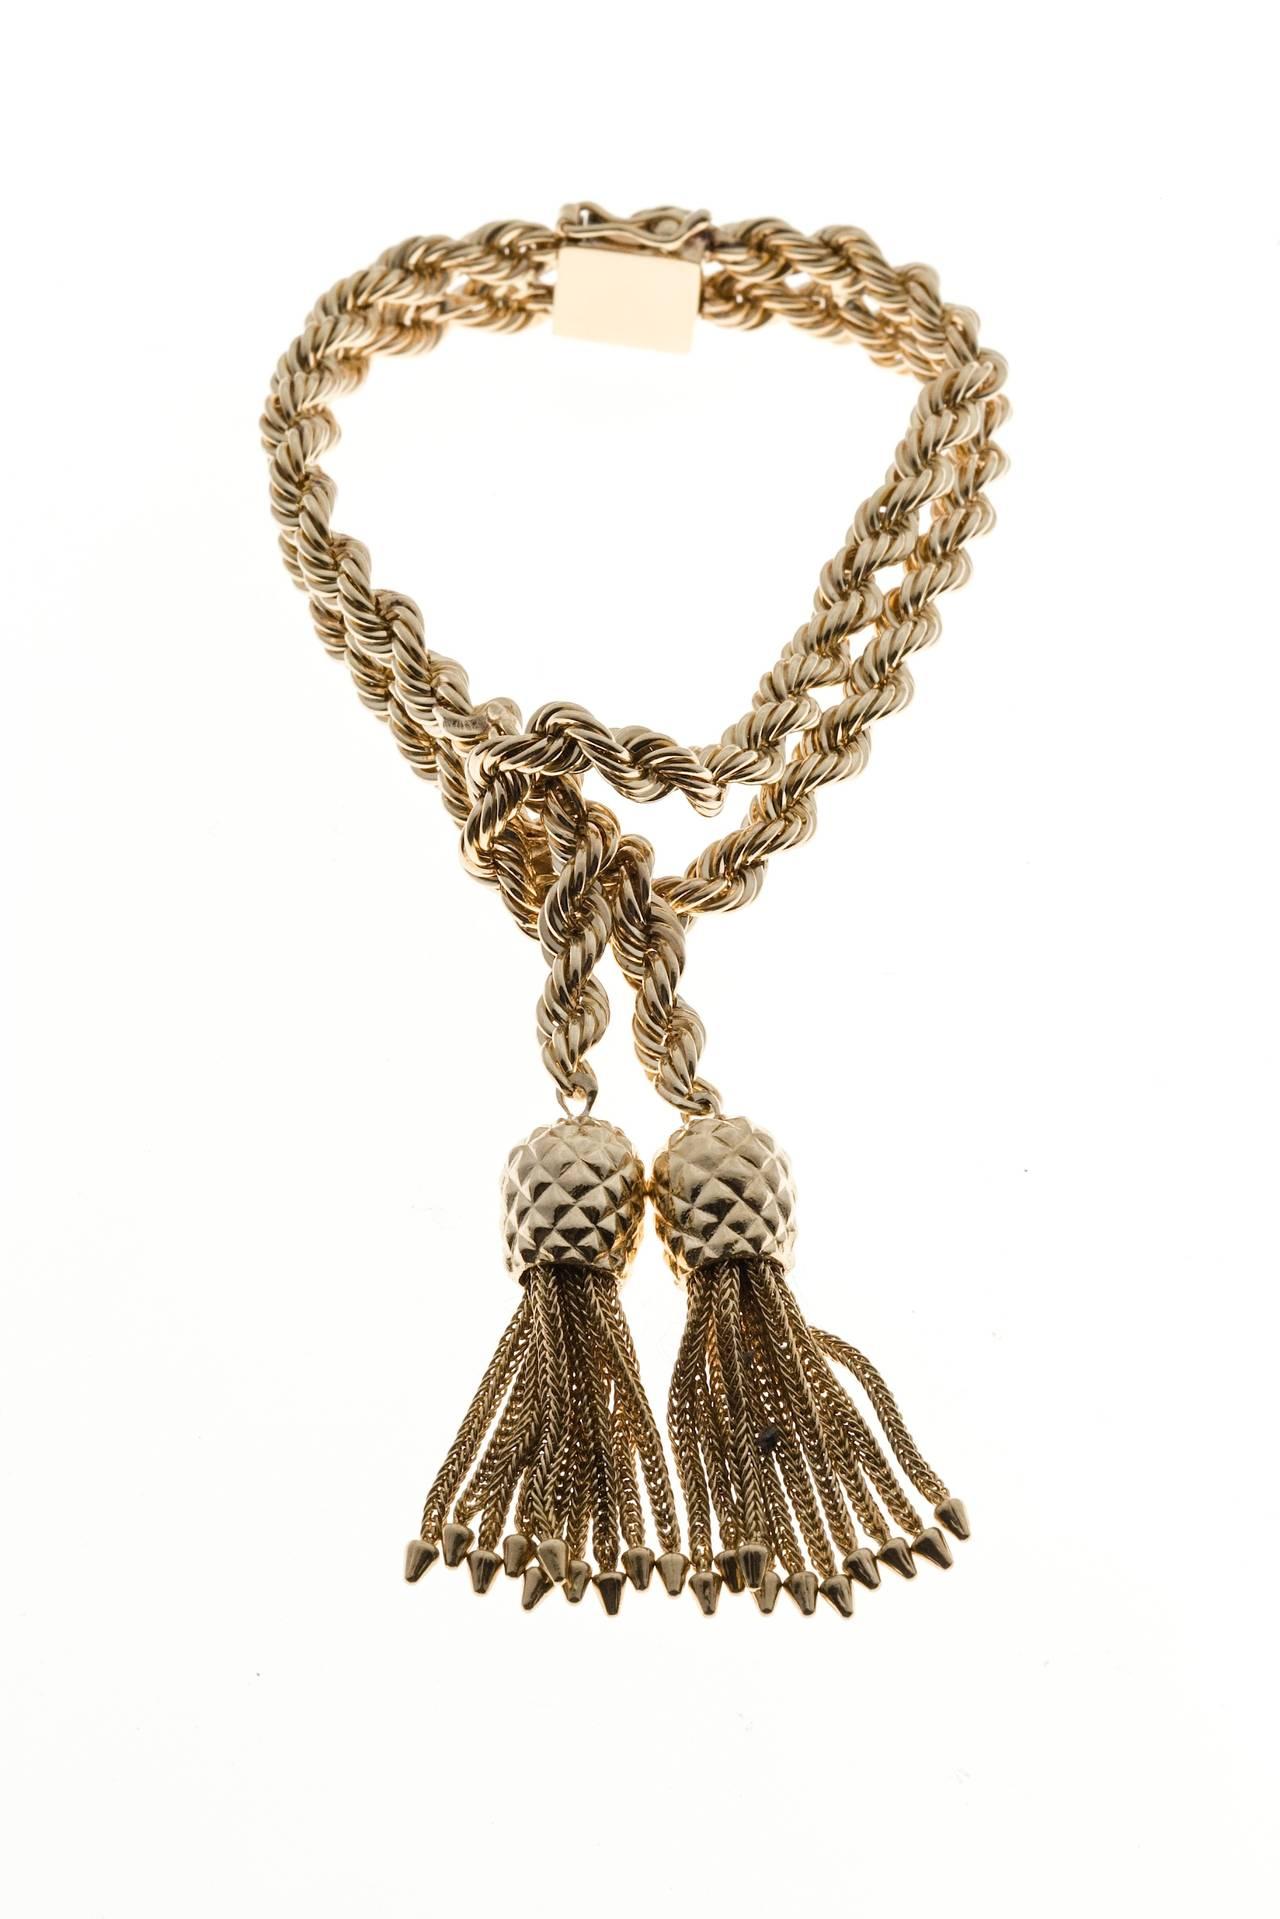 Tiffany & Co. Rope Knot Tassel Gold Bracelet For Sale 1